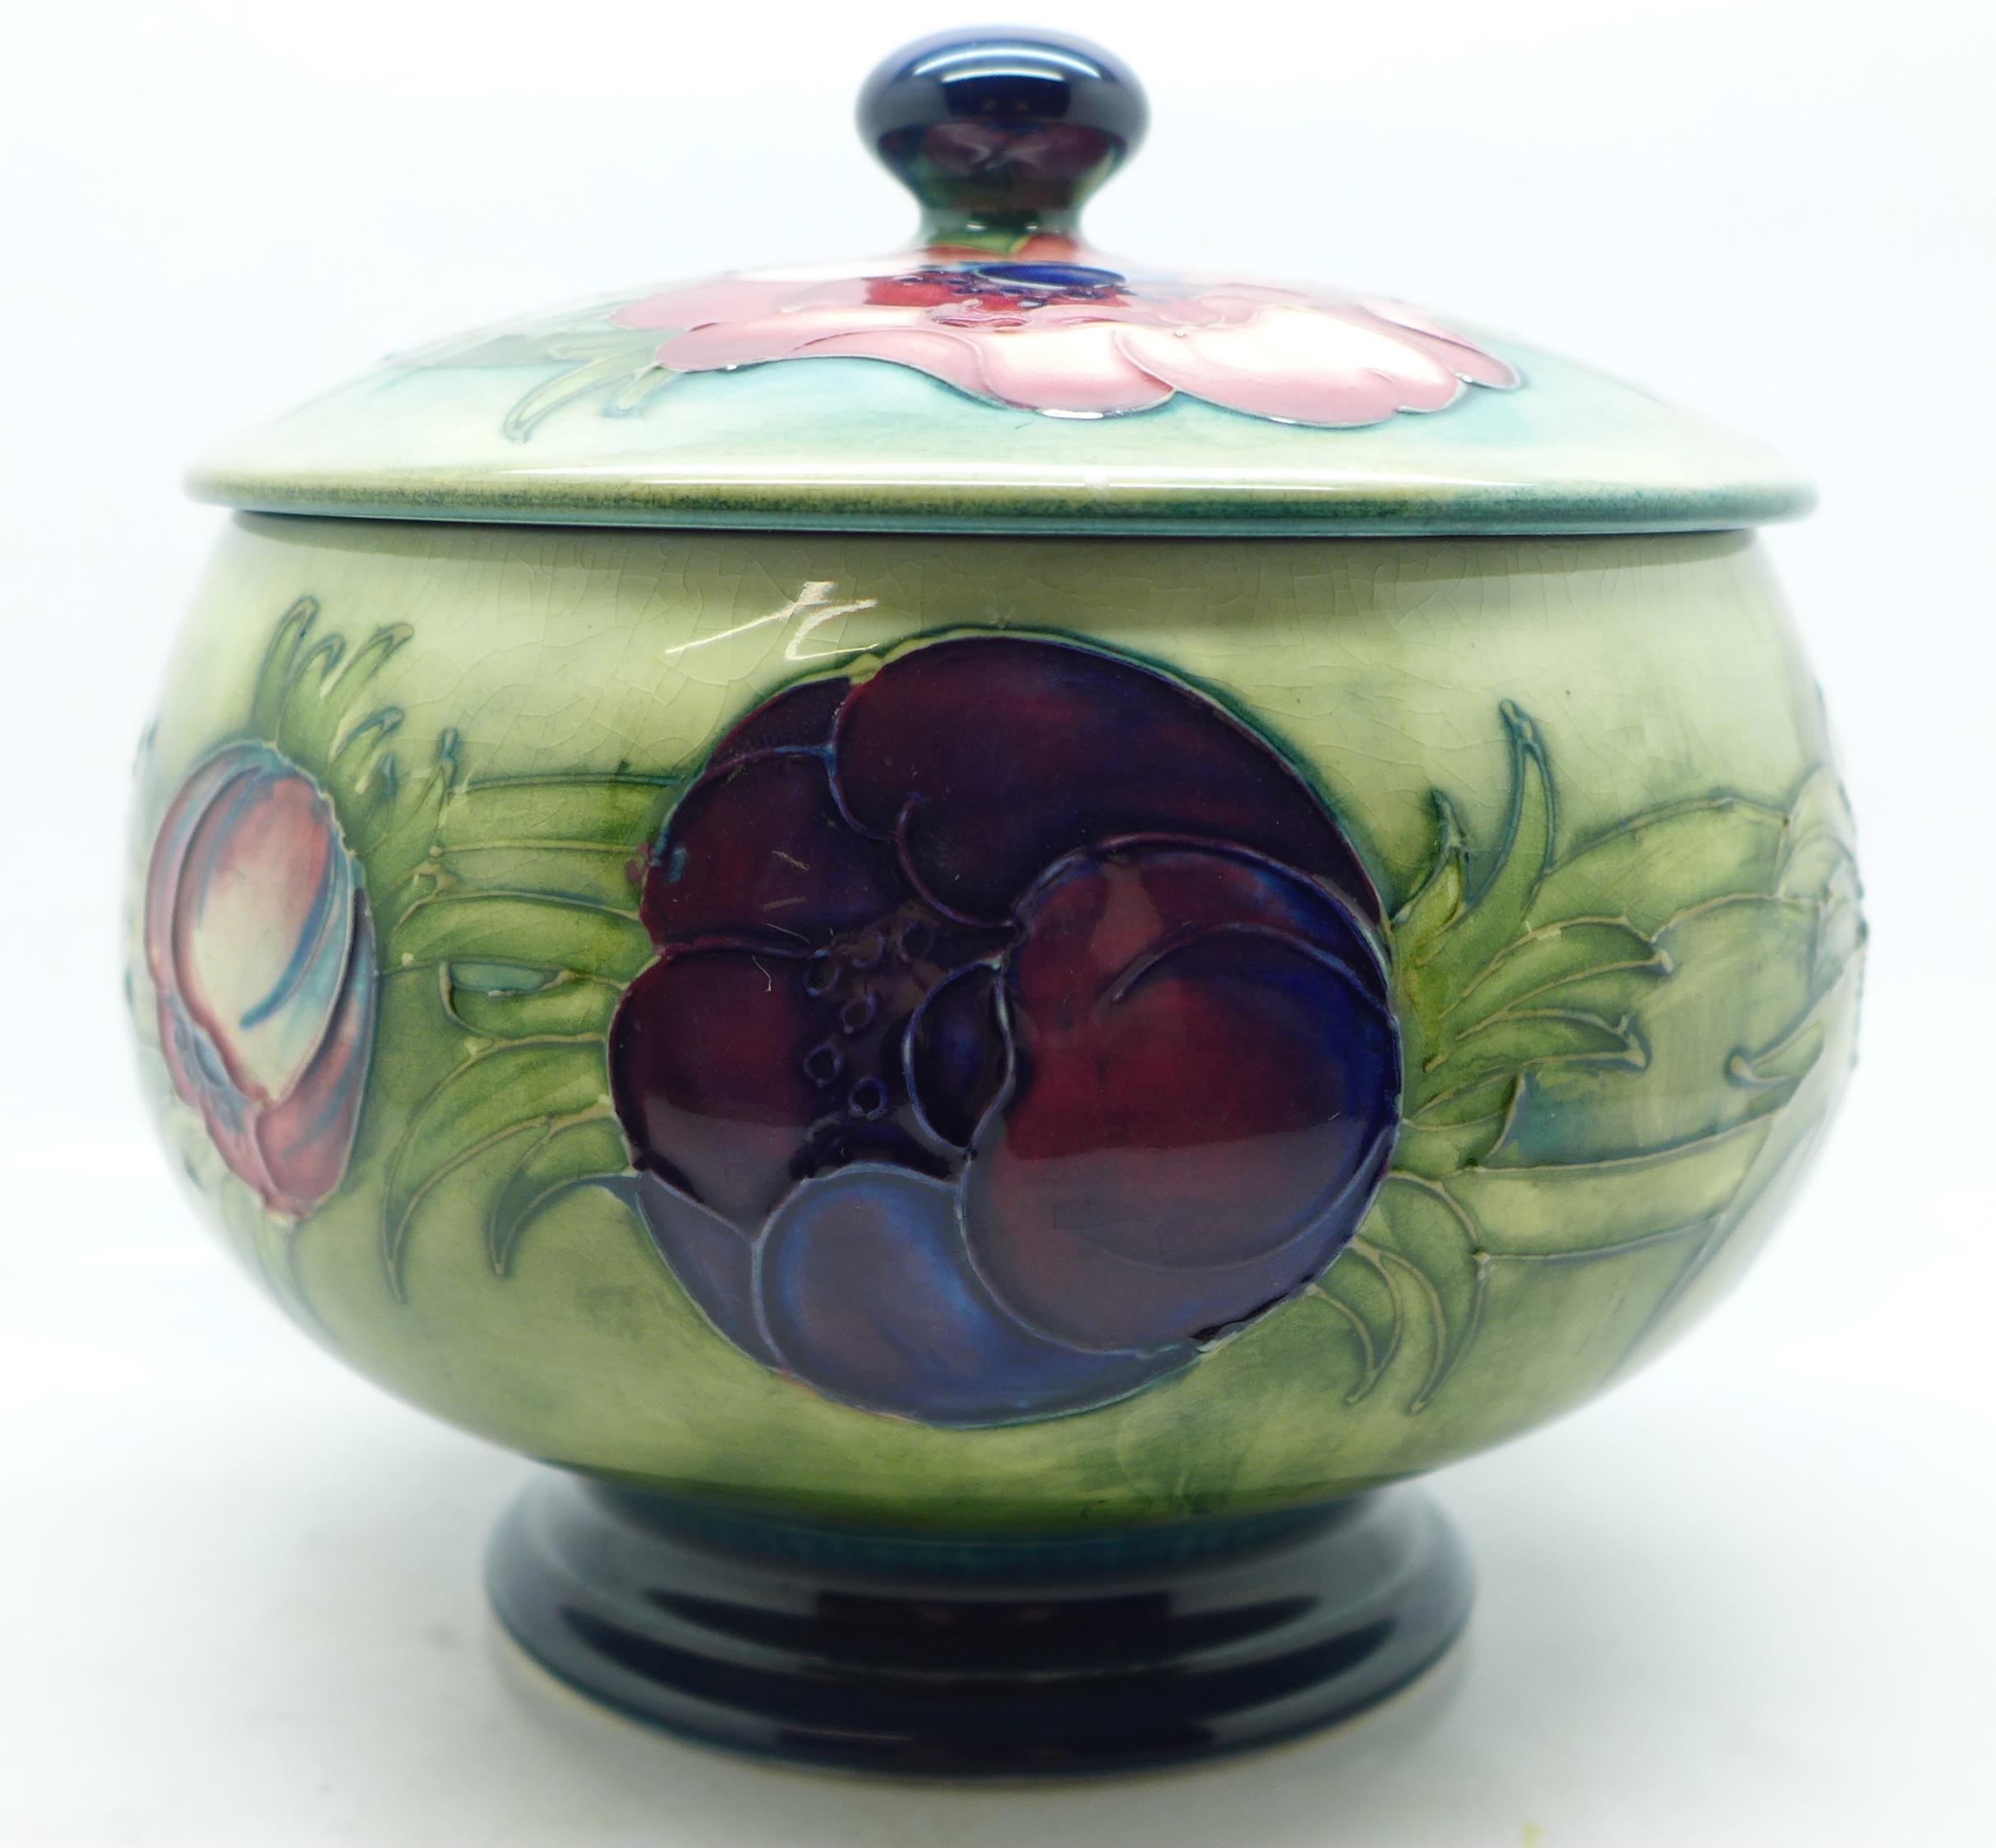 A Moorcroft anemone lidded pot, 12.5cm diameter - Image 2 of 8